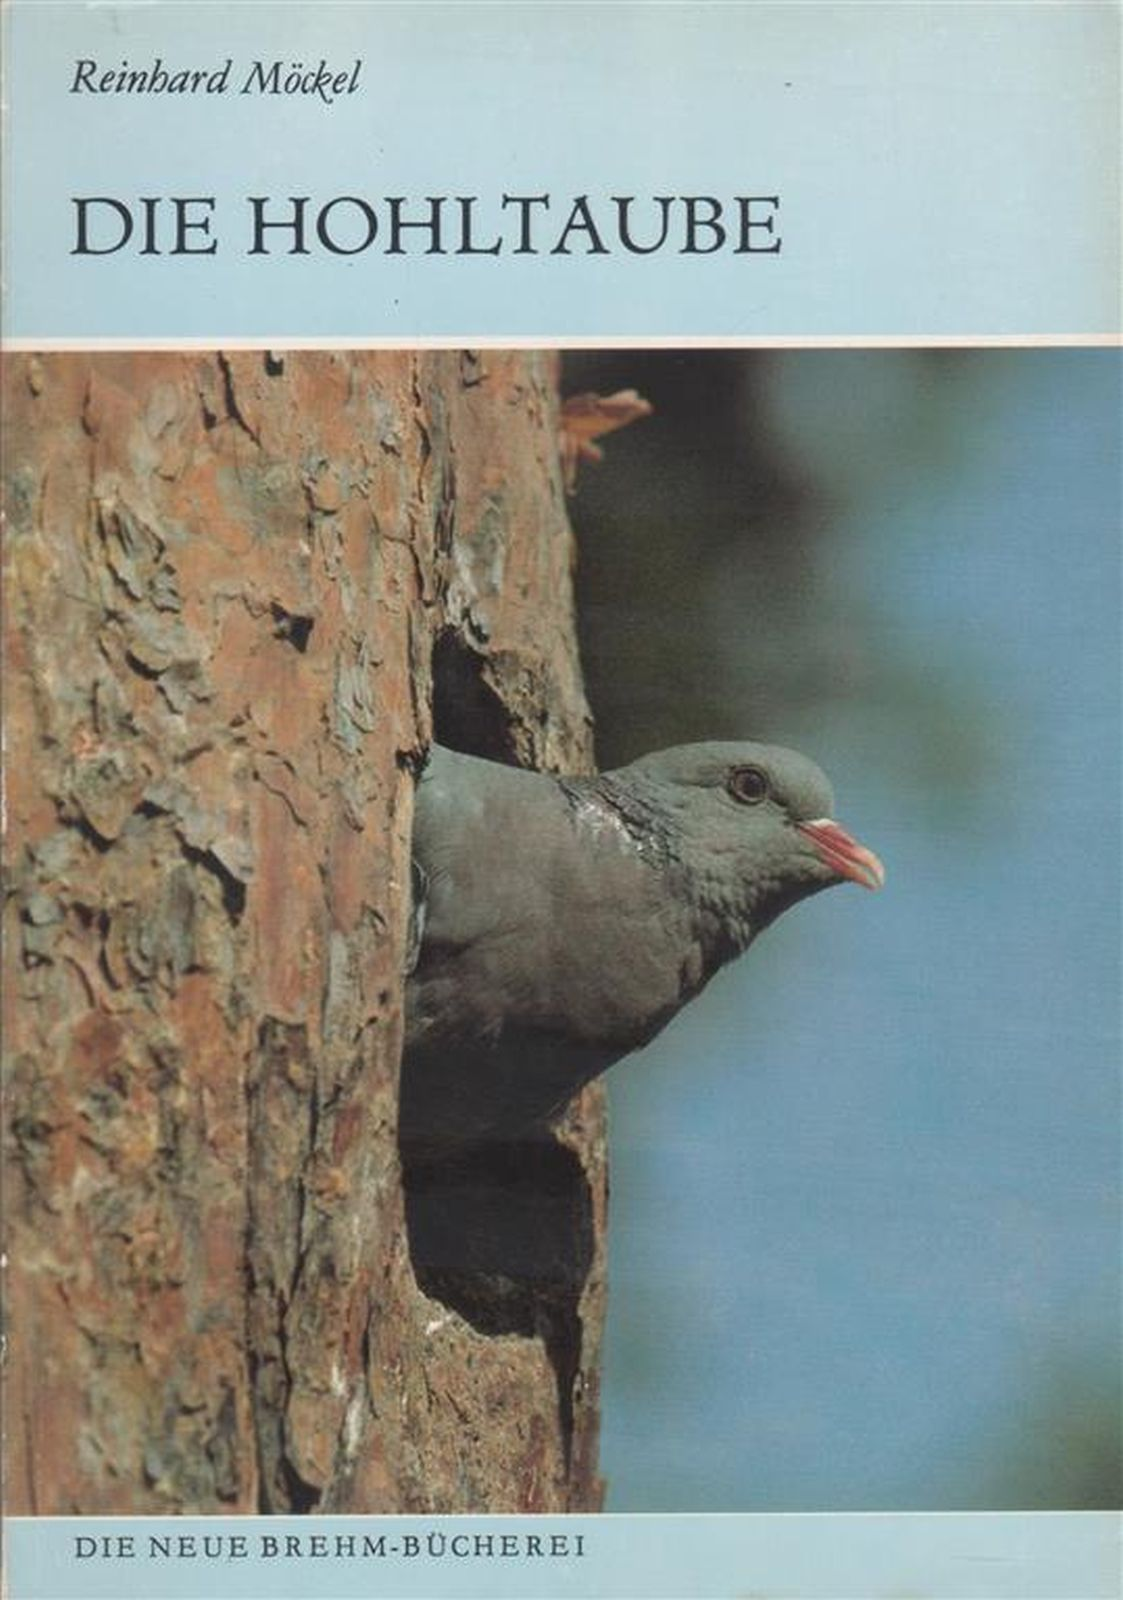 Die Hohltaube (Columba oenas) - MÖCKEL, Reinhard